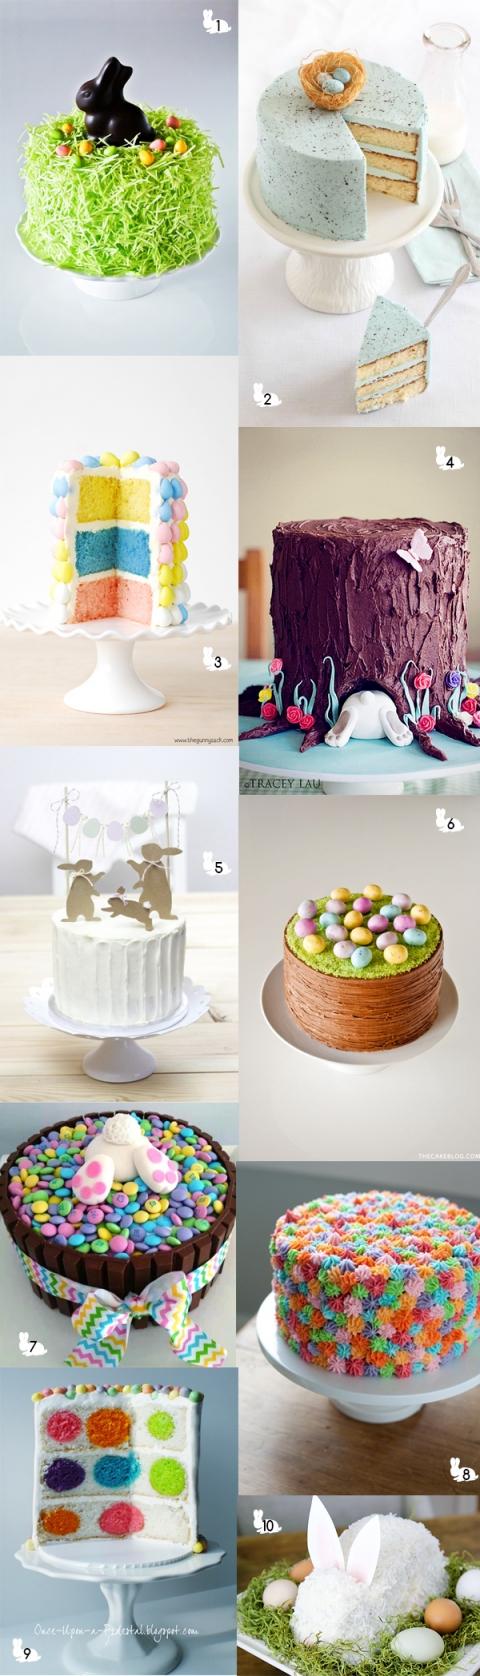 10-Amazing-Easter-Cakes